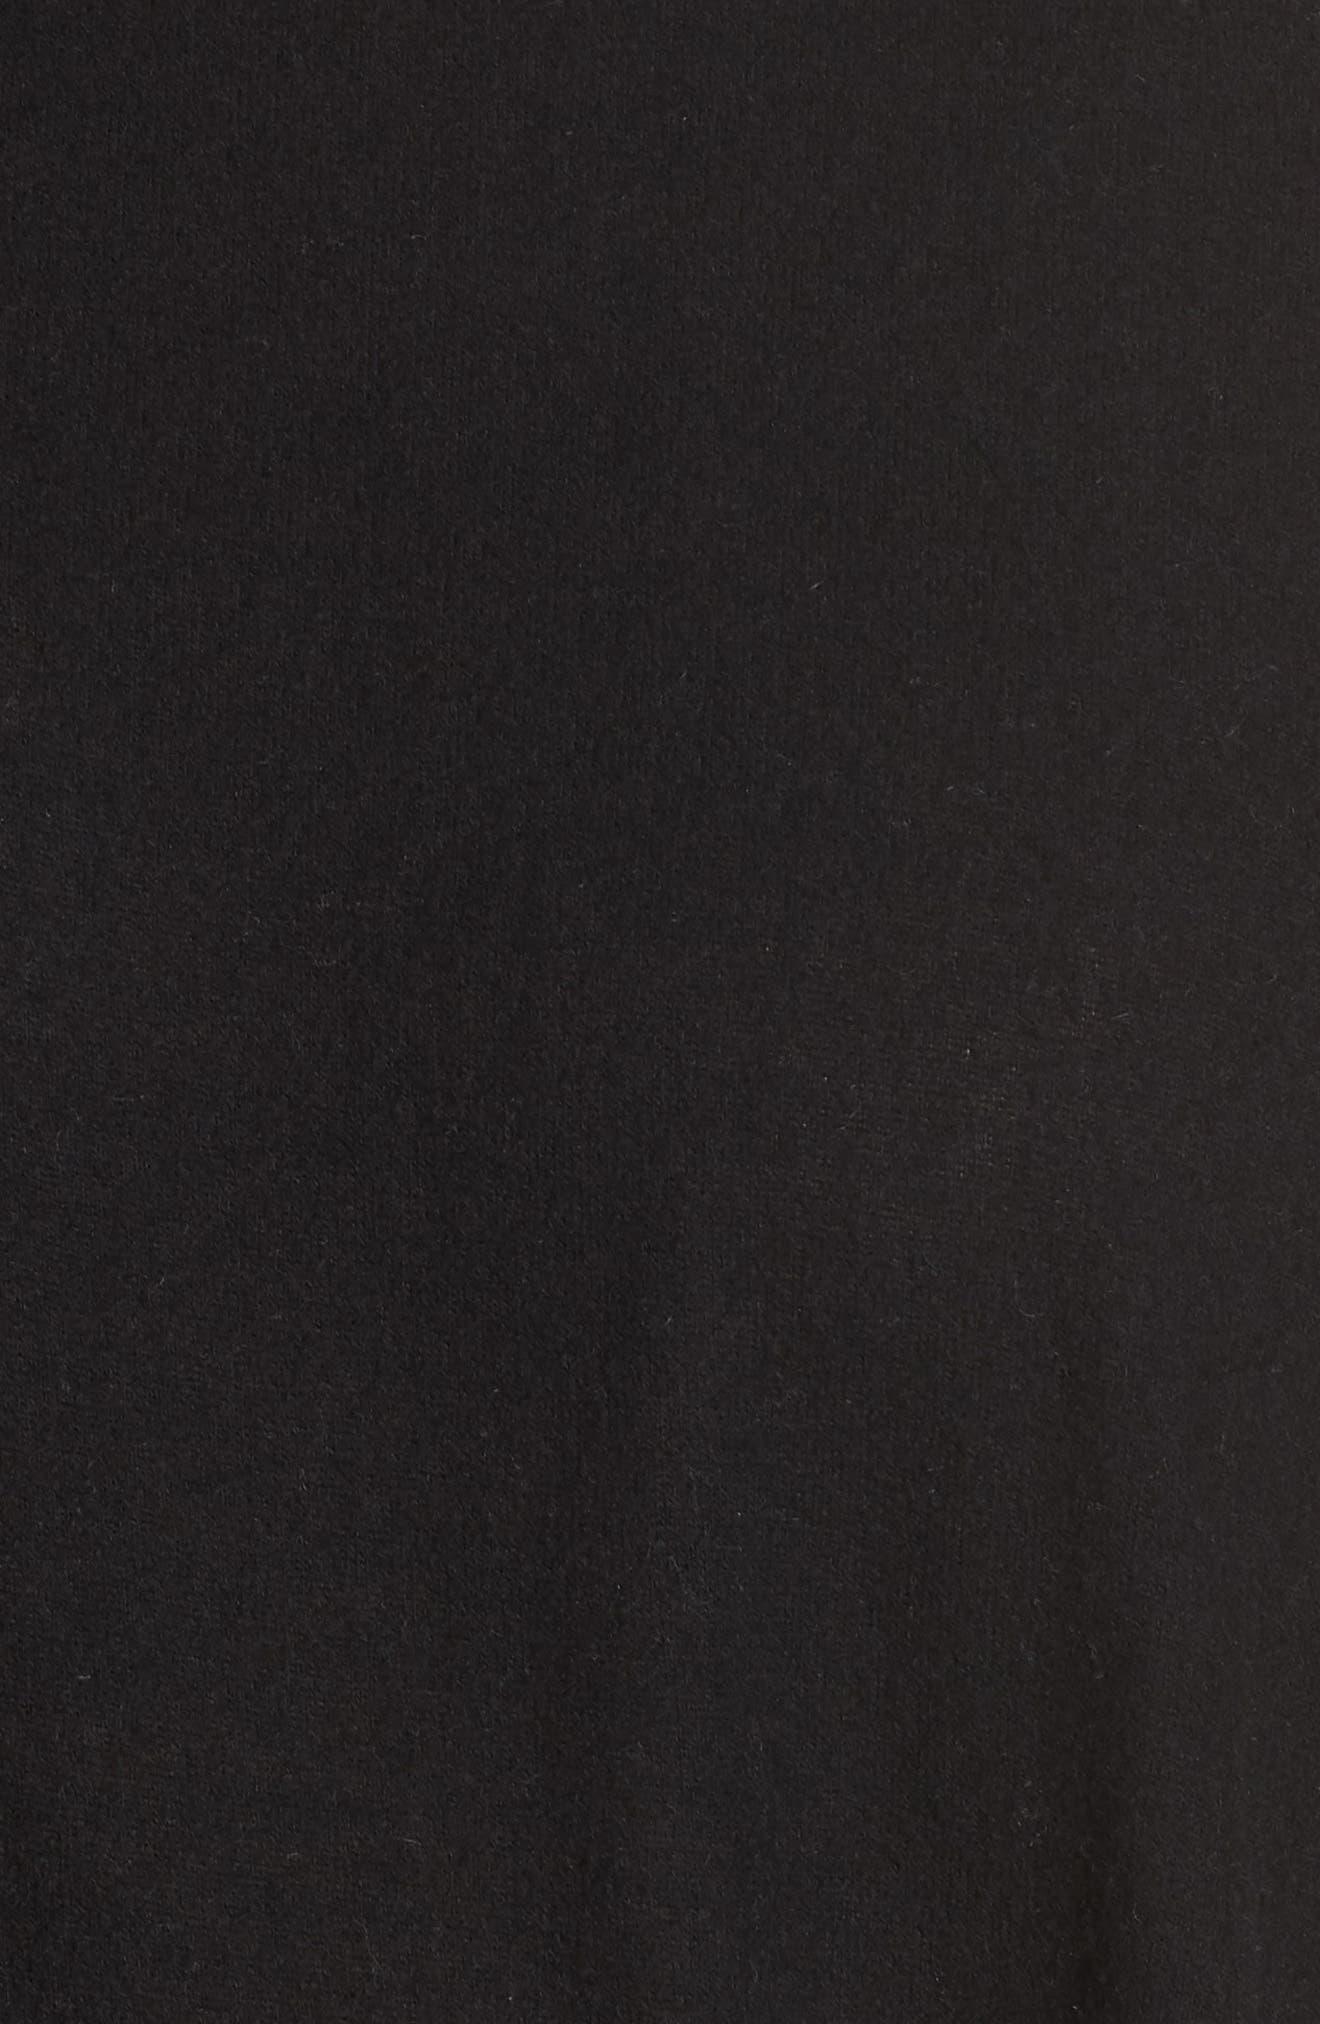 Fuzzy Tie Front Sweatshirt,                             Alternate thumbnail 5, color,                             BLACK